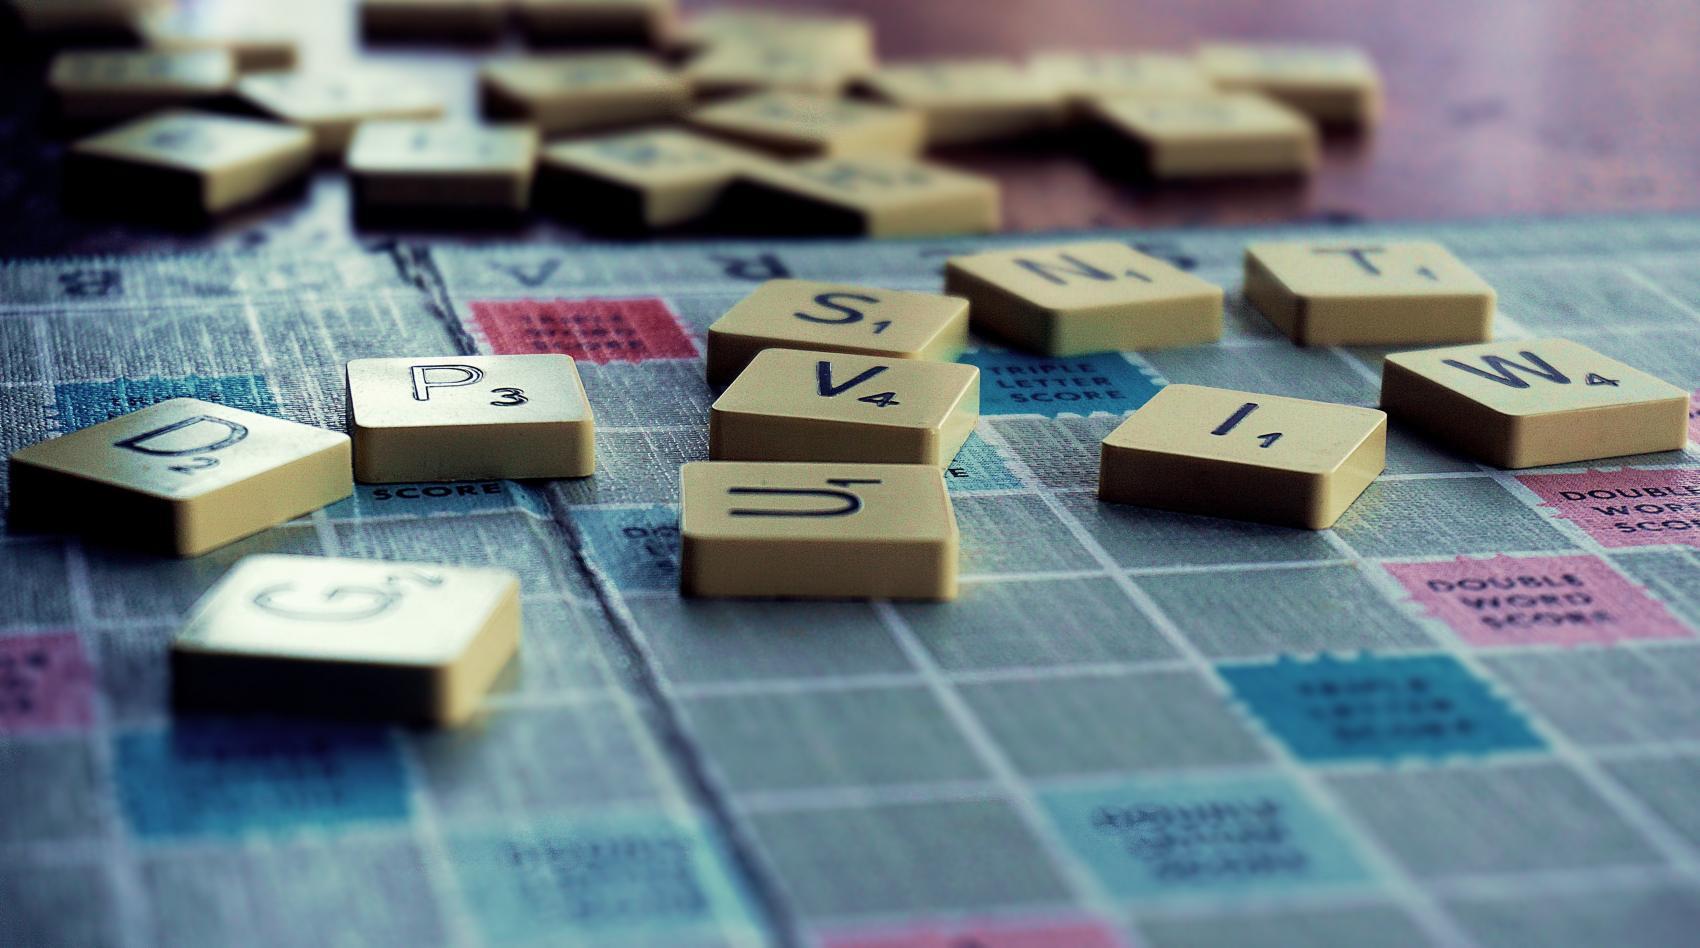 gra planszowa Scrabble